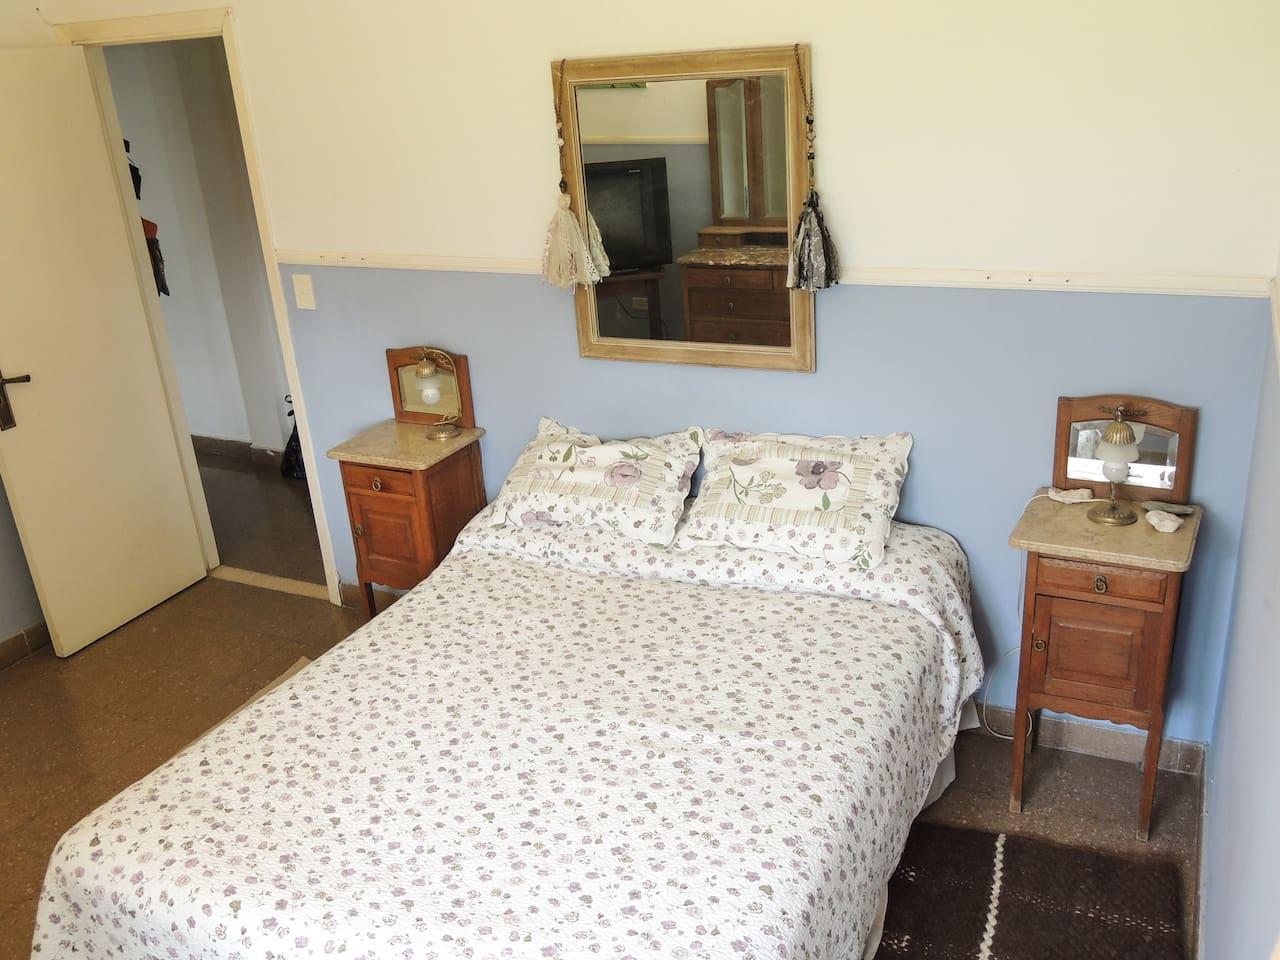 Habitacion privada cama matrimonial sommier, placard, y dresuar